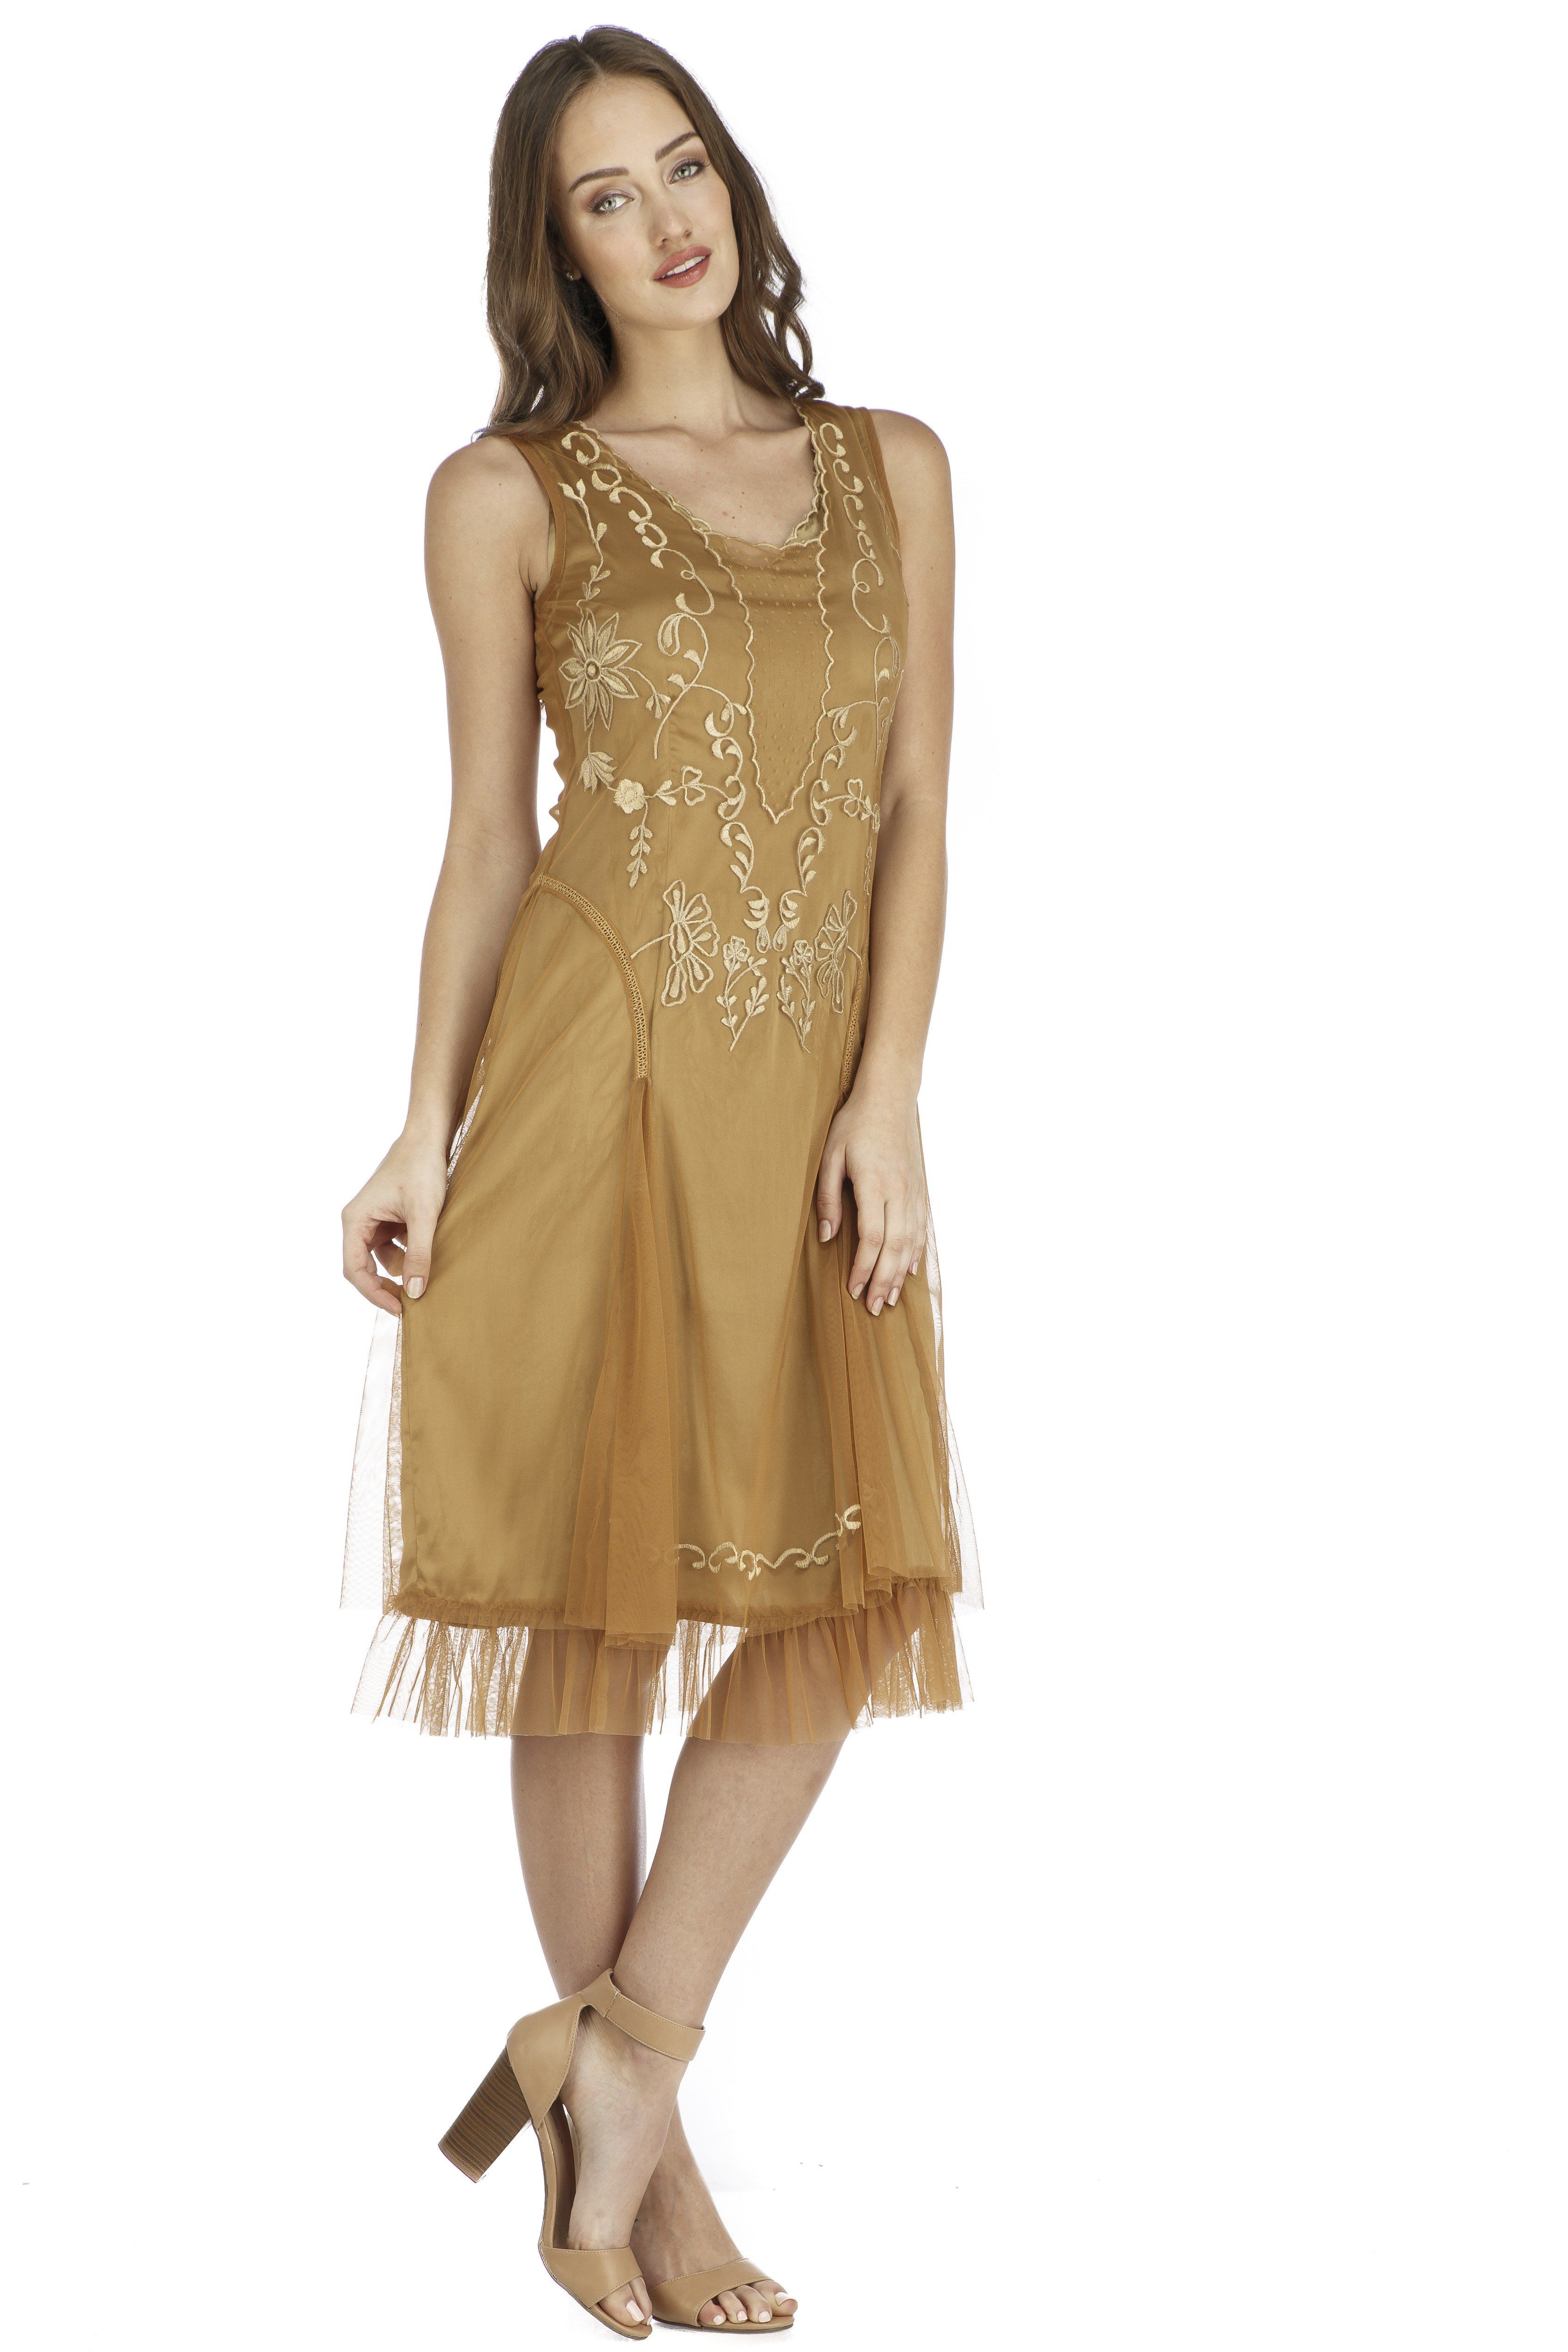 Tara Vintage Style Party Dress in Bronze by Nataya